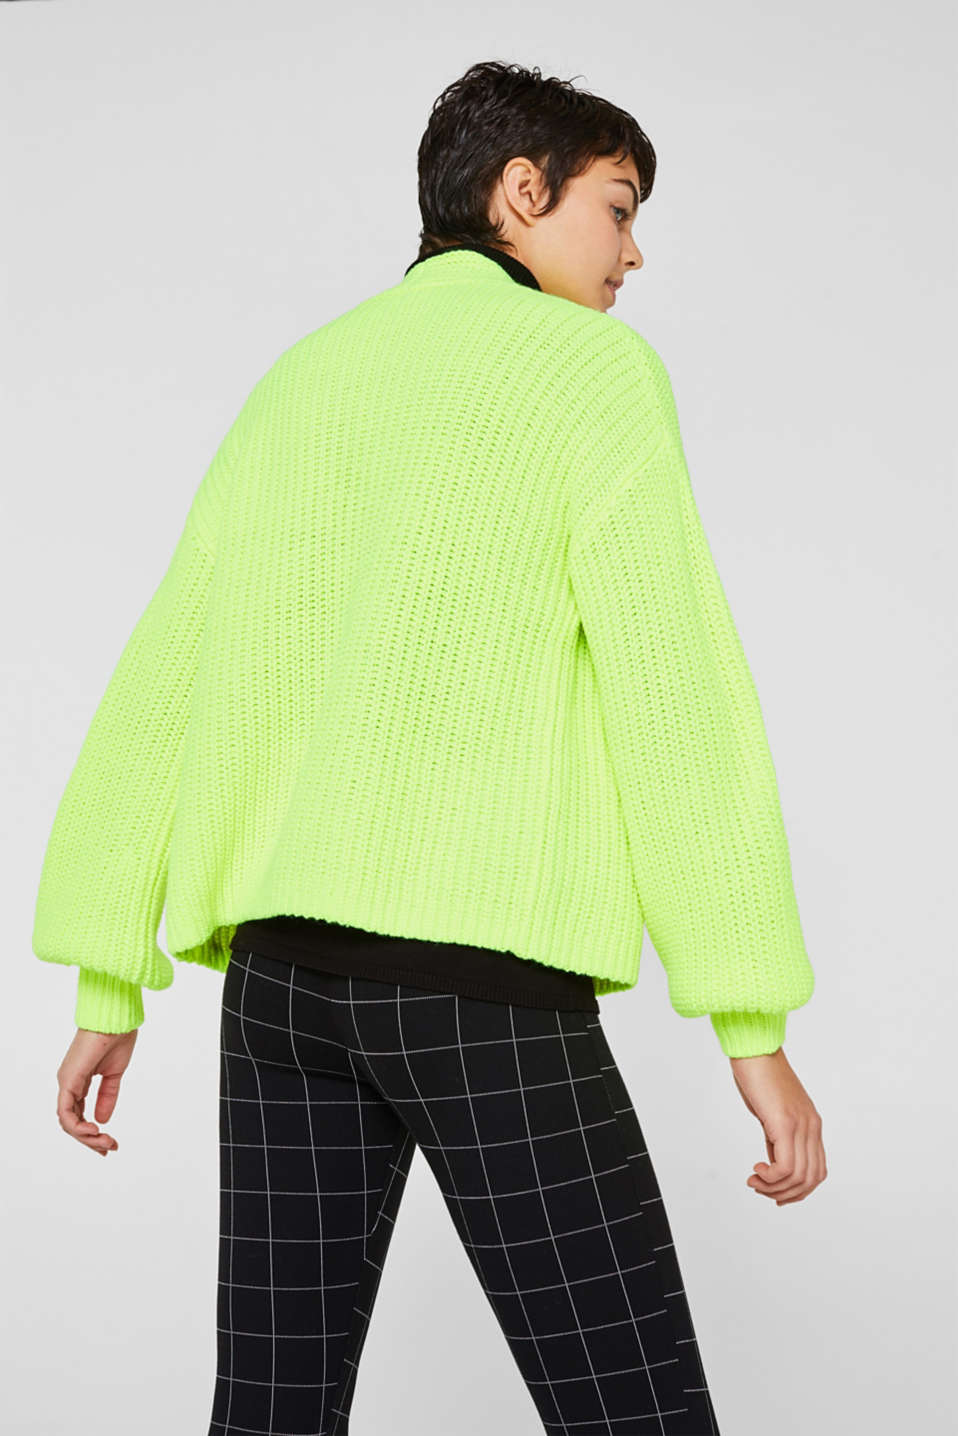 Open rib knit NEON cardigan, PASTEL YELLOW, detail image number 3